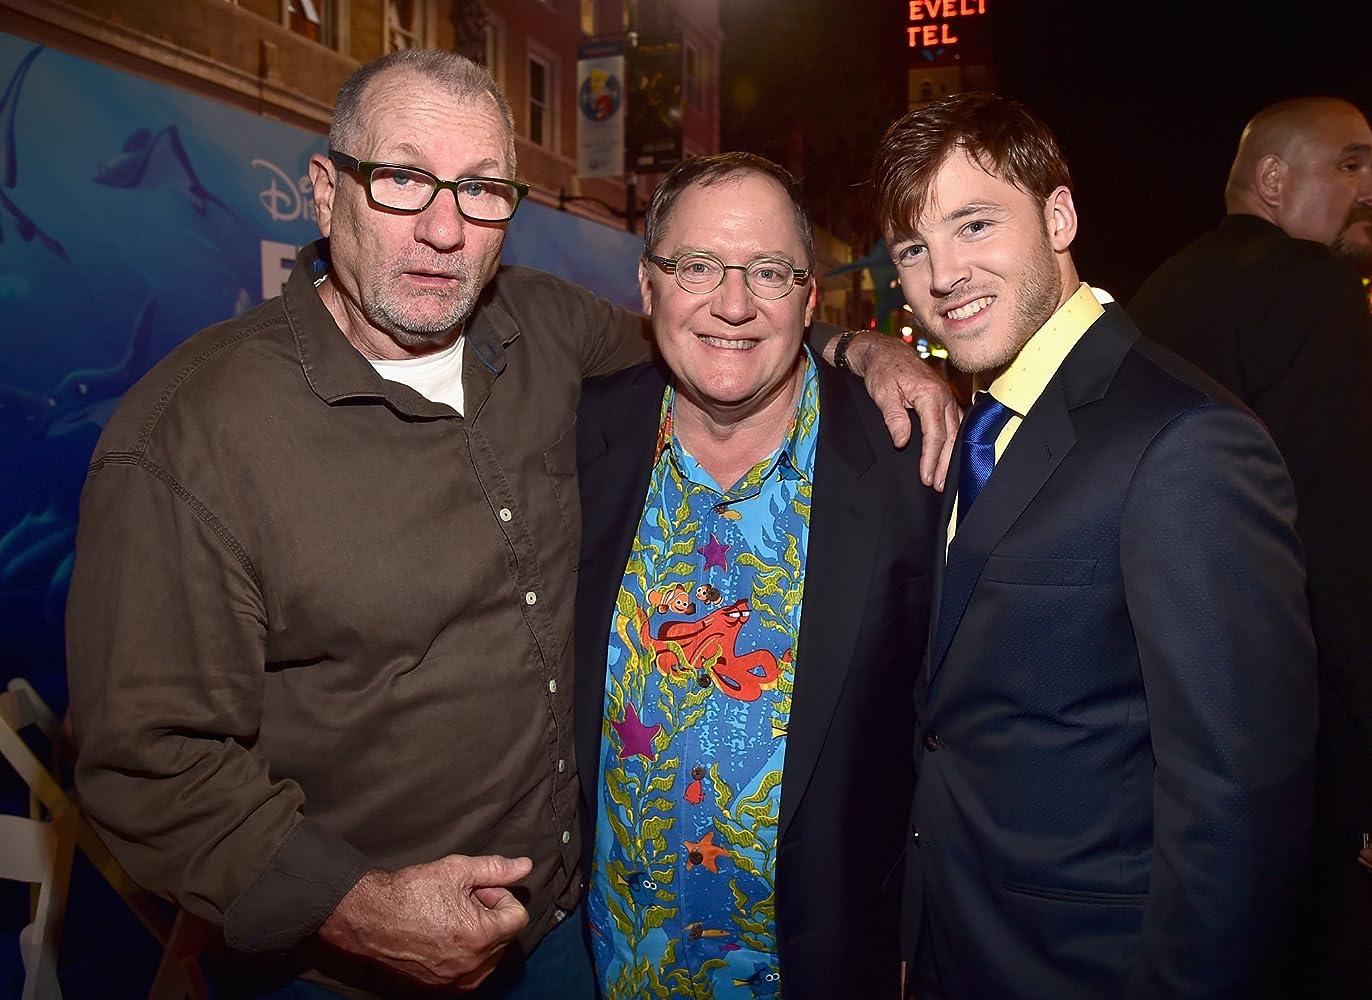 John Lasseter, Ed O